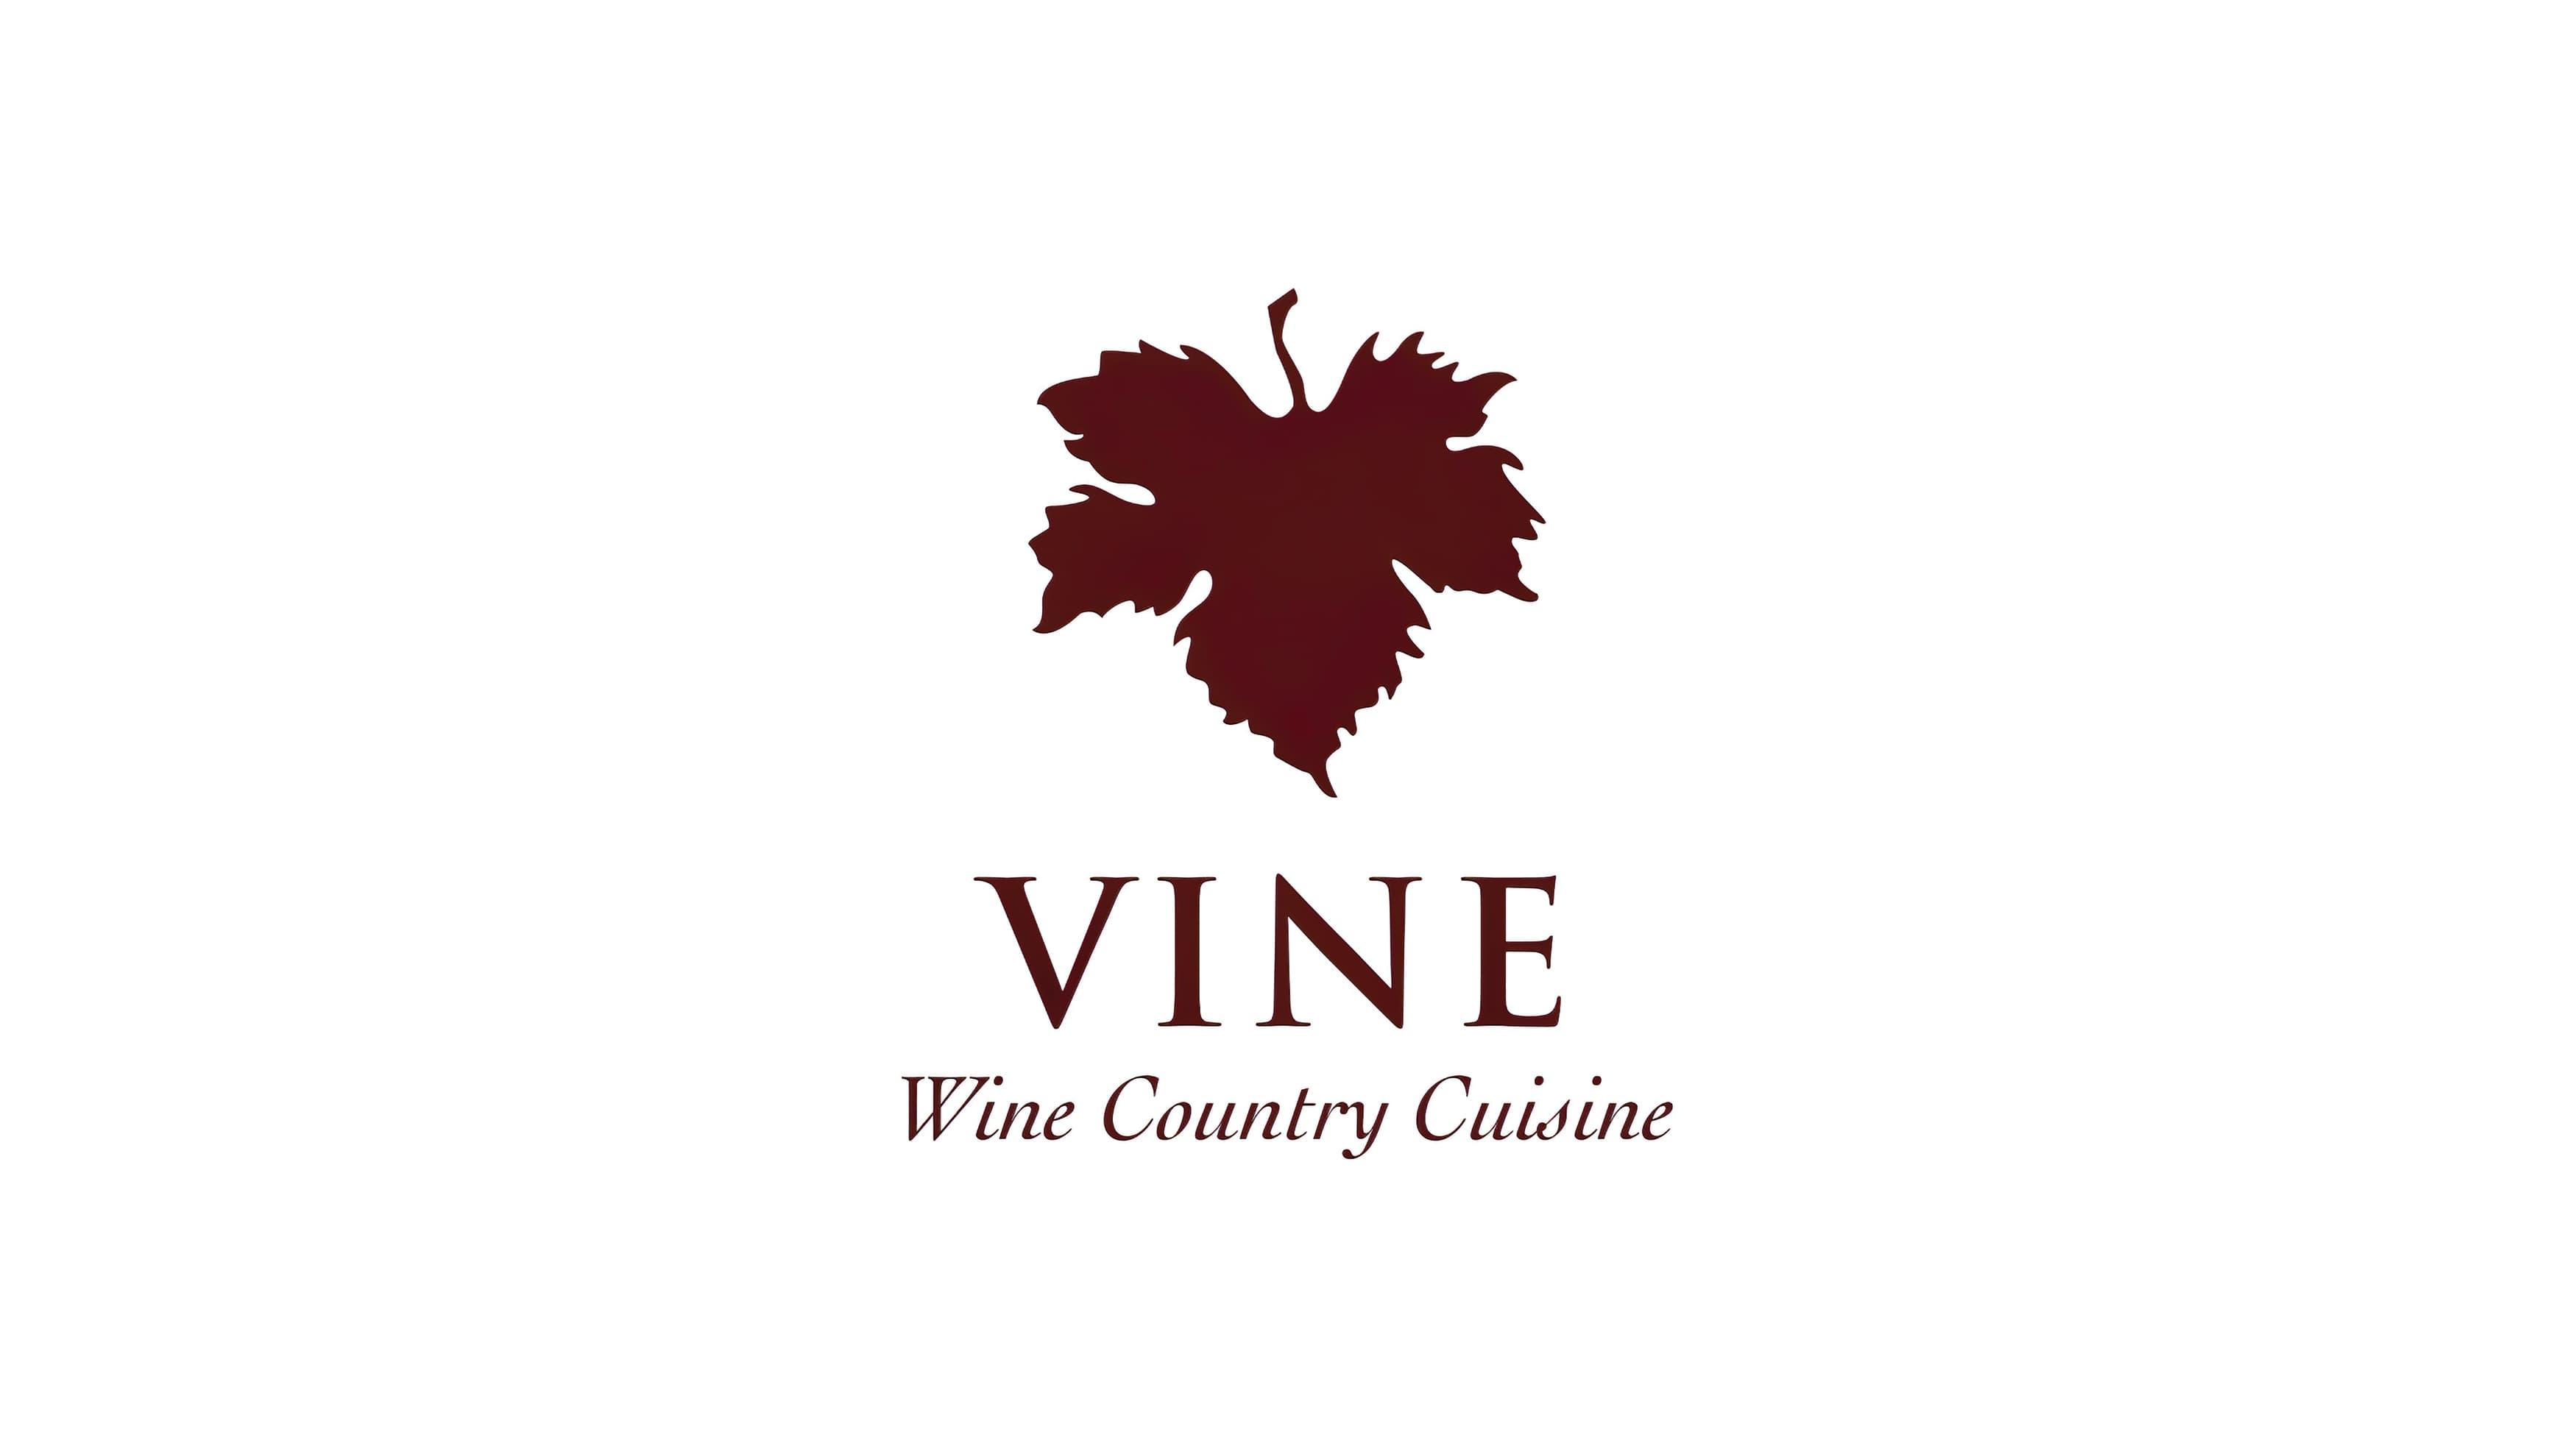 Logo design for The Vine featuring a distinctive leaf mark.